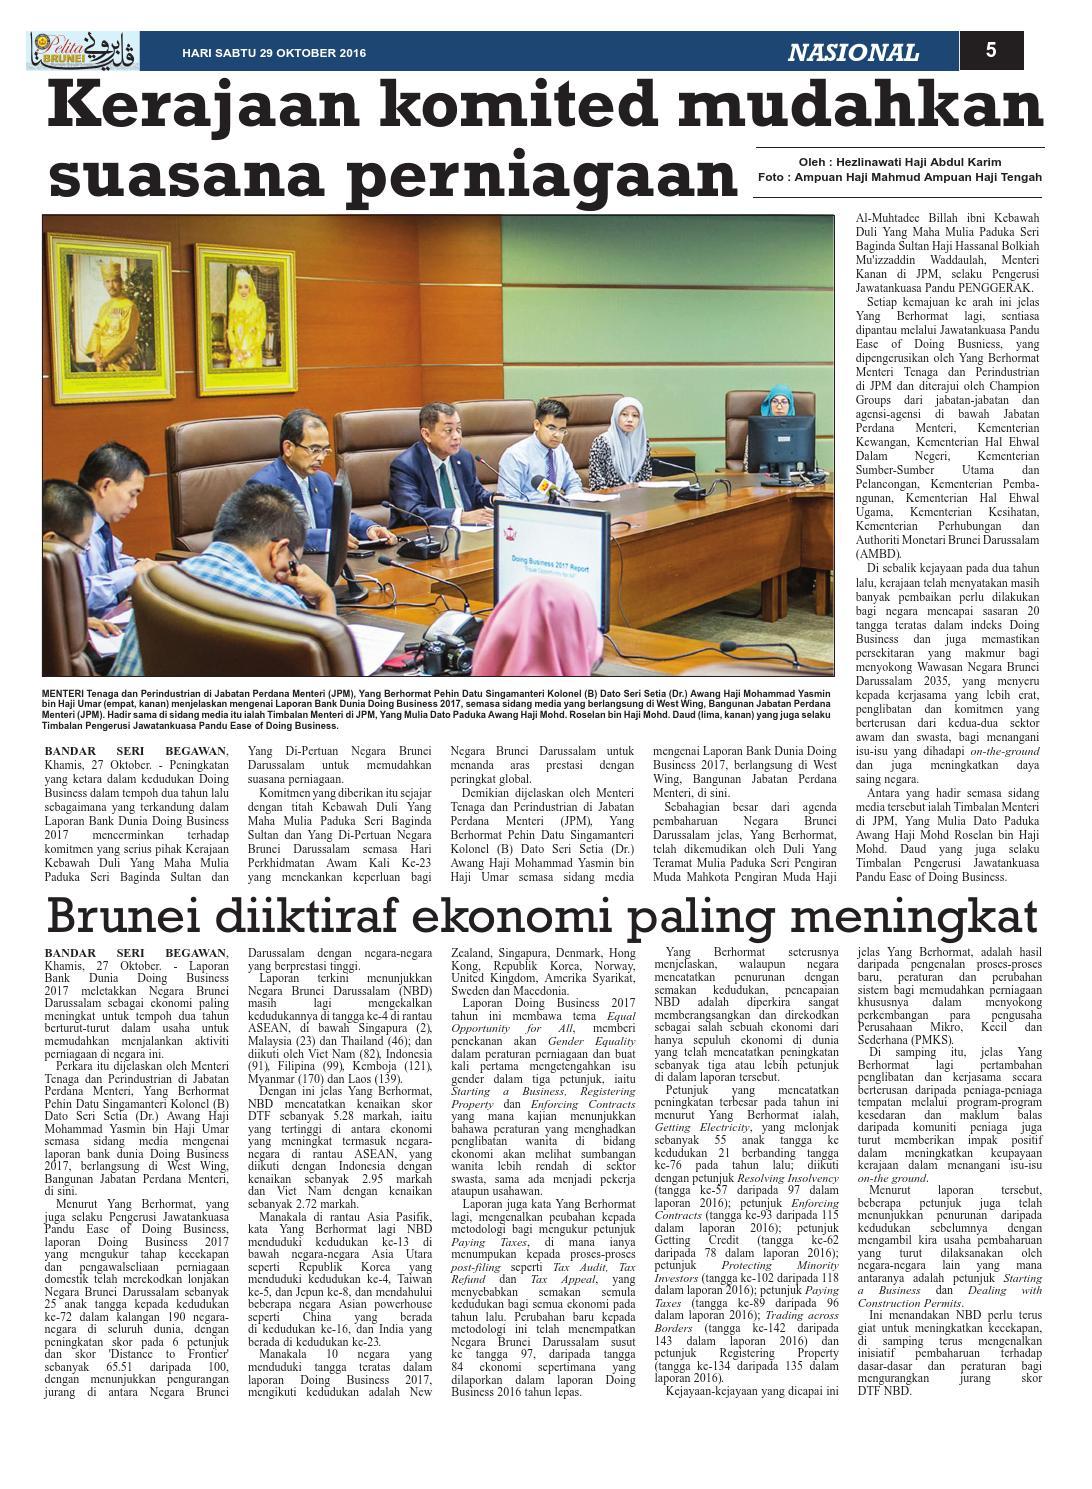 Pelita Brunei Sabtu 29 Okt 2016 by Putera Katak Brunei - issuu